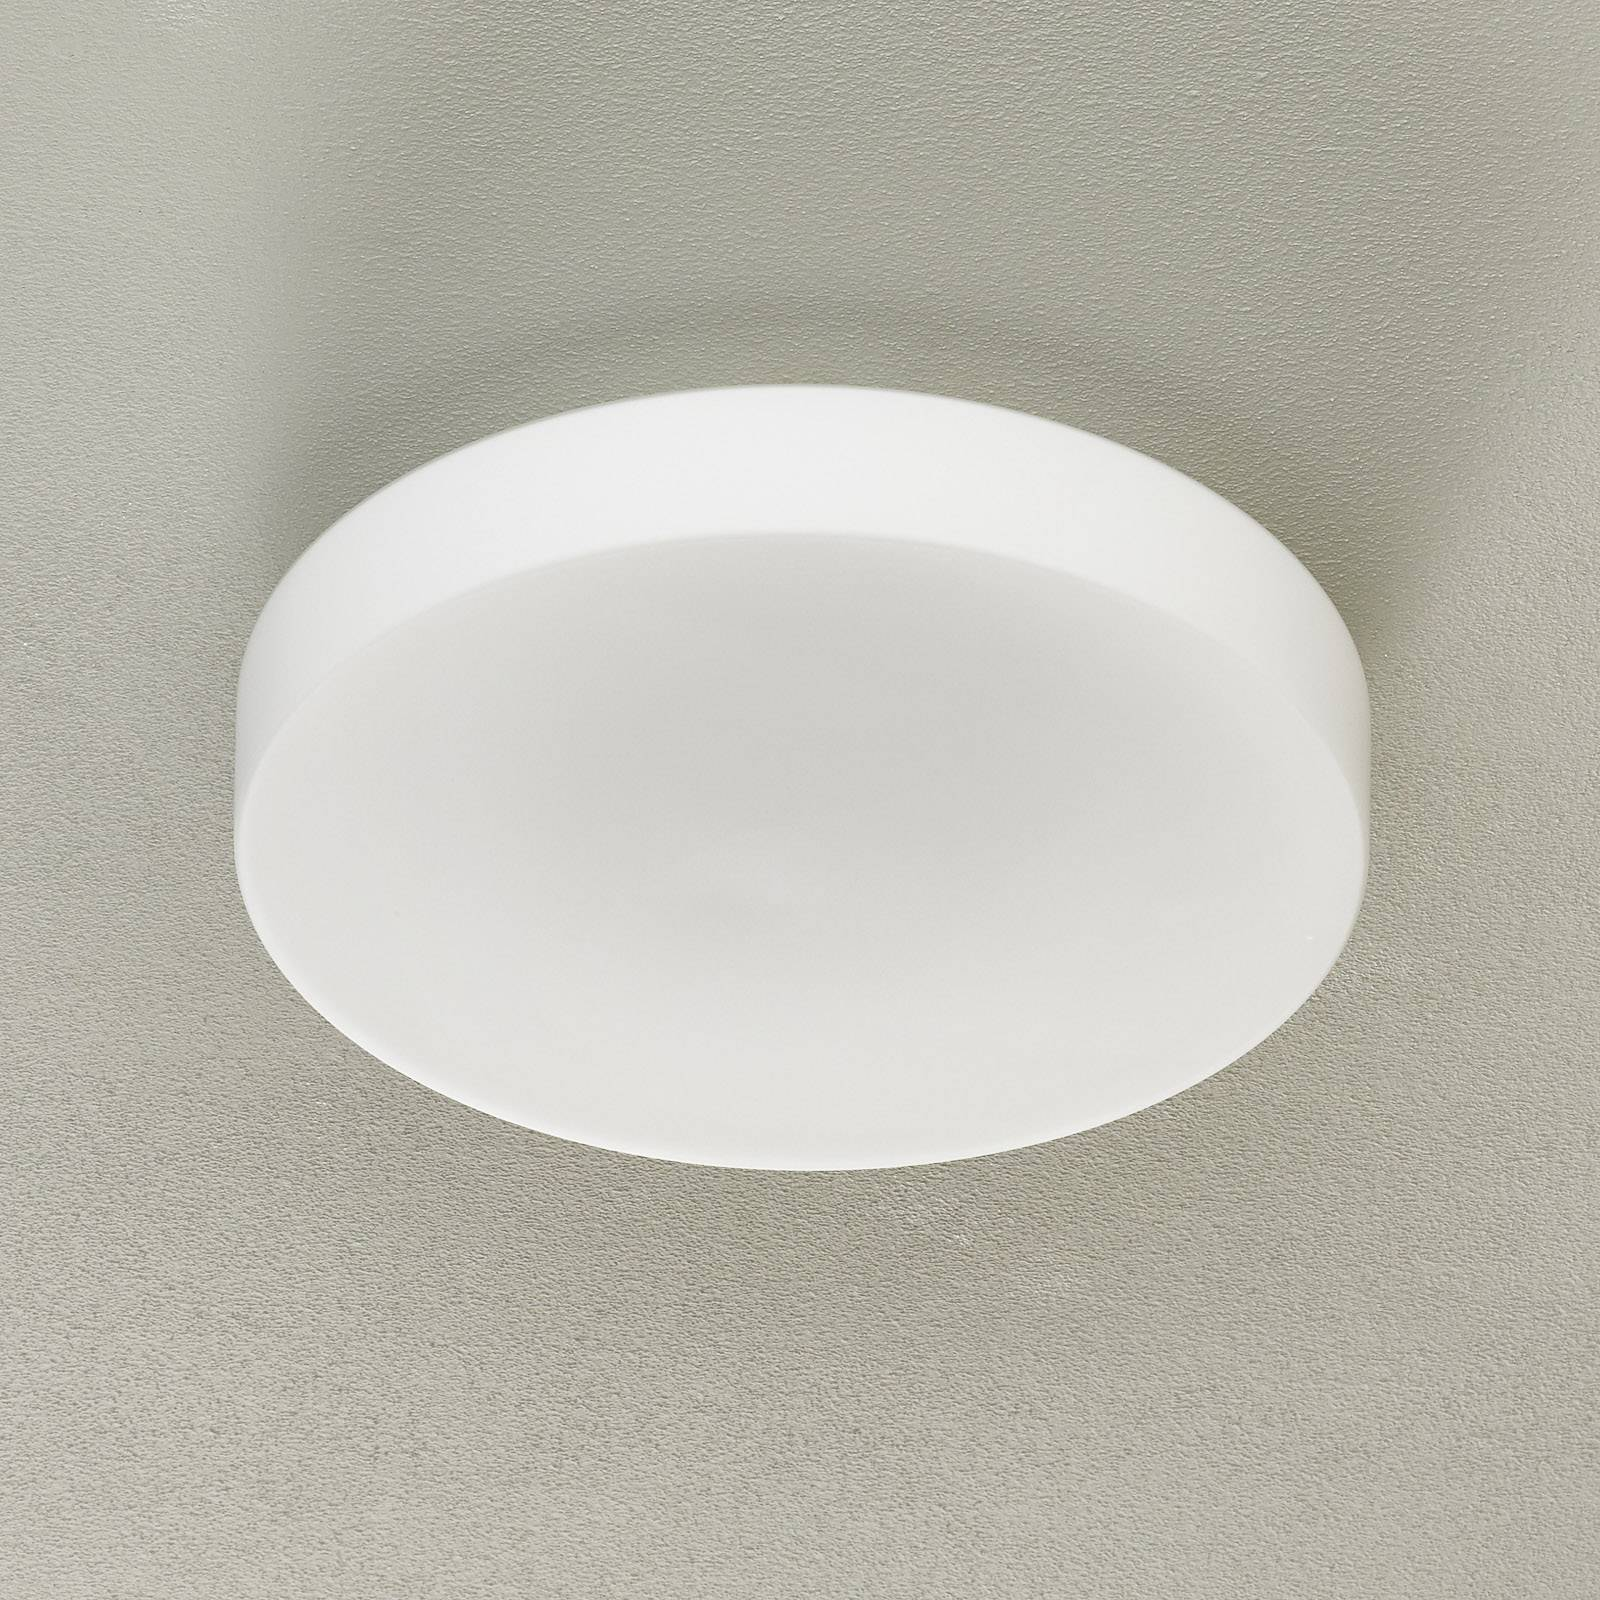 BEGA 89765 LED-kattolamppu E27 valkoinen Ø 39cm